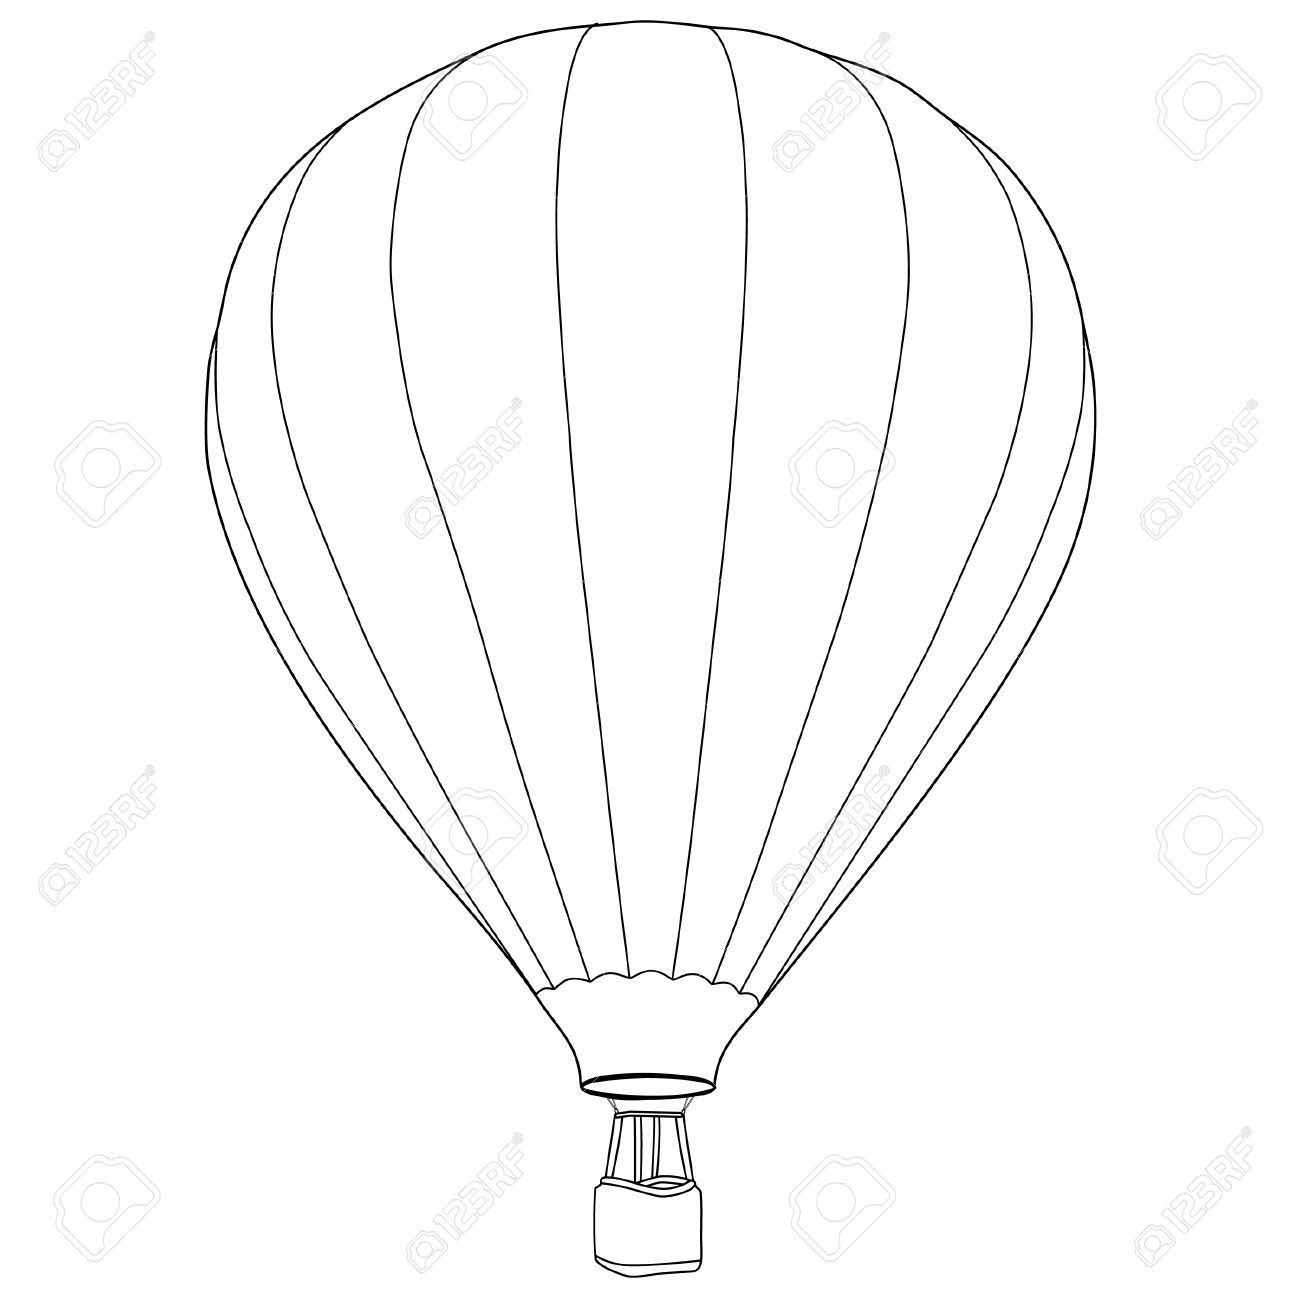 Stock Vector Air Balloon Hot Air Balloon Clipart Hot Air Balloon